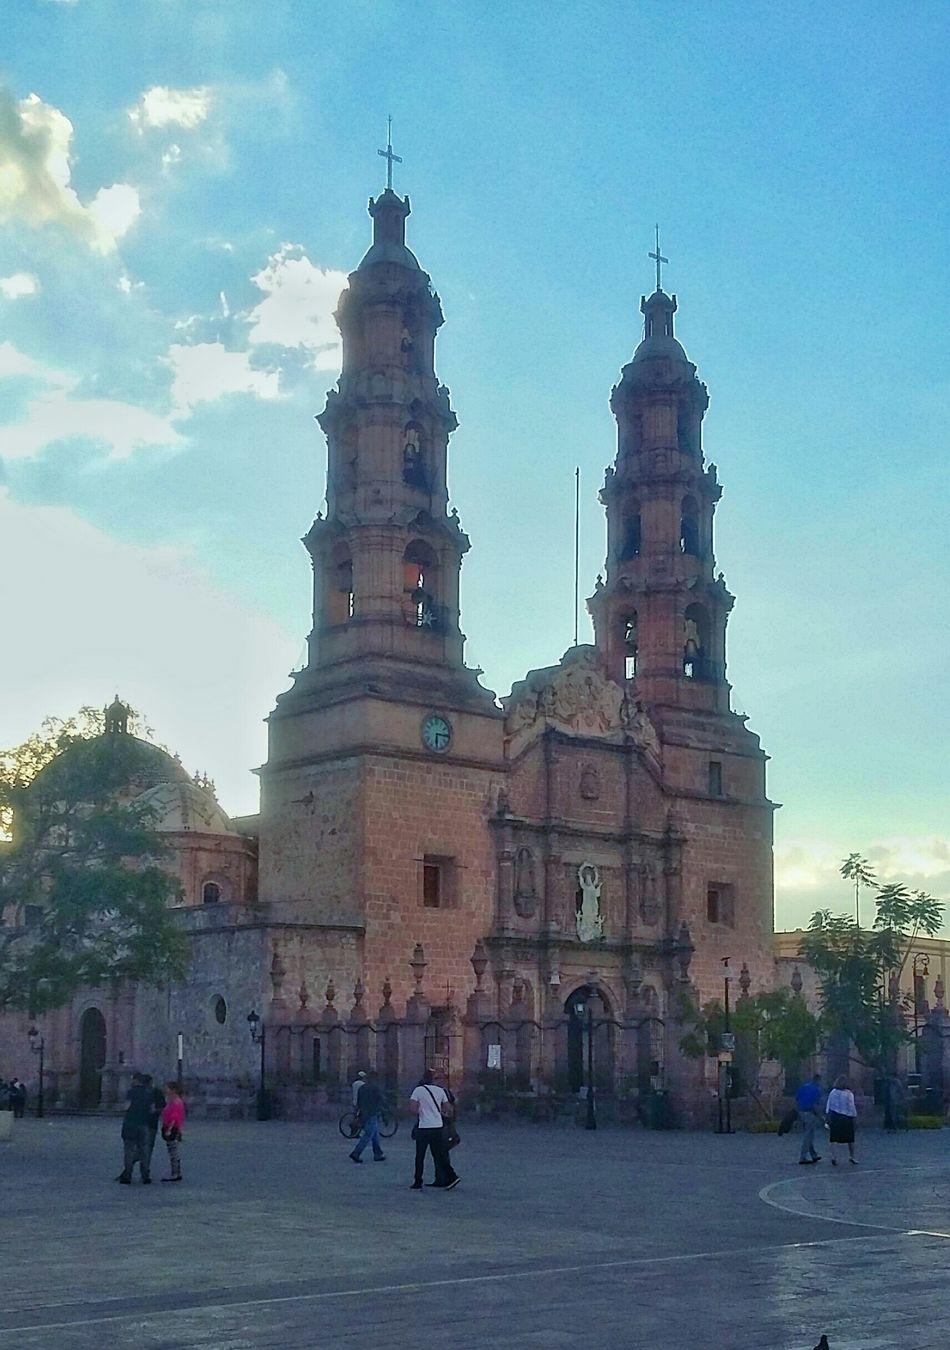 Esta es la catedral de mi lindo Aguascalientes... Aguascalientes Catedral NuestraSeñoraDeLaAsunción